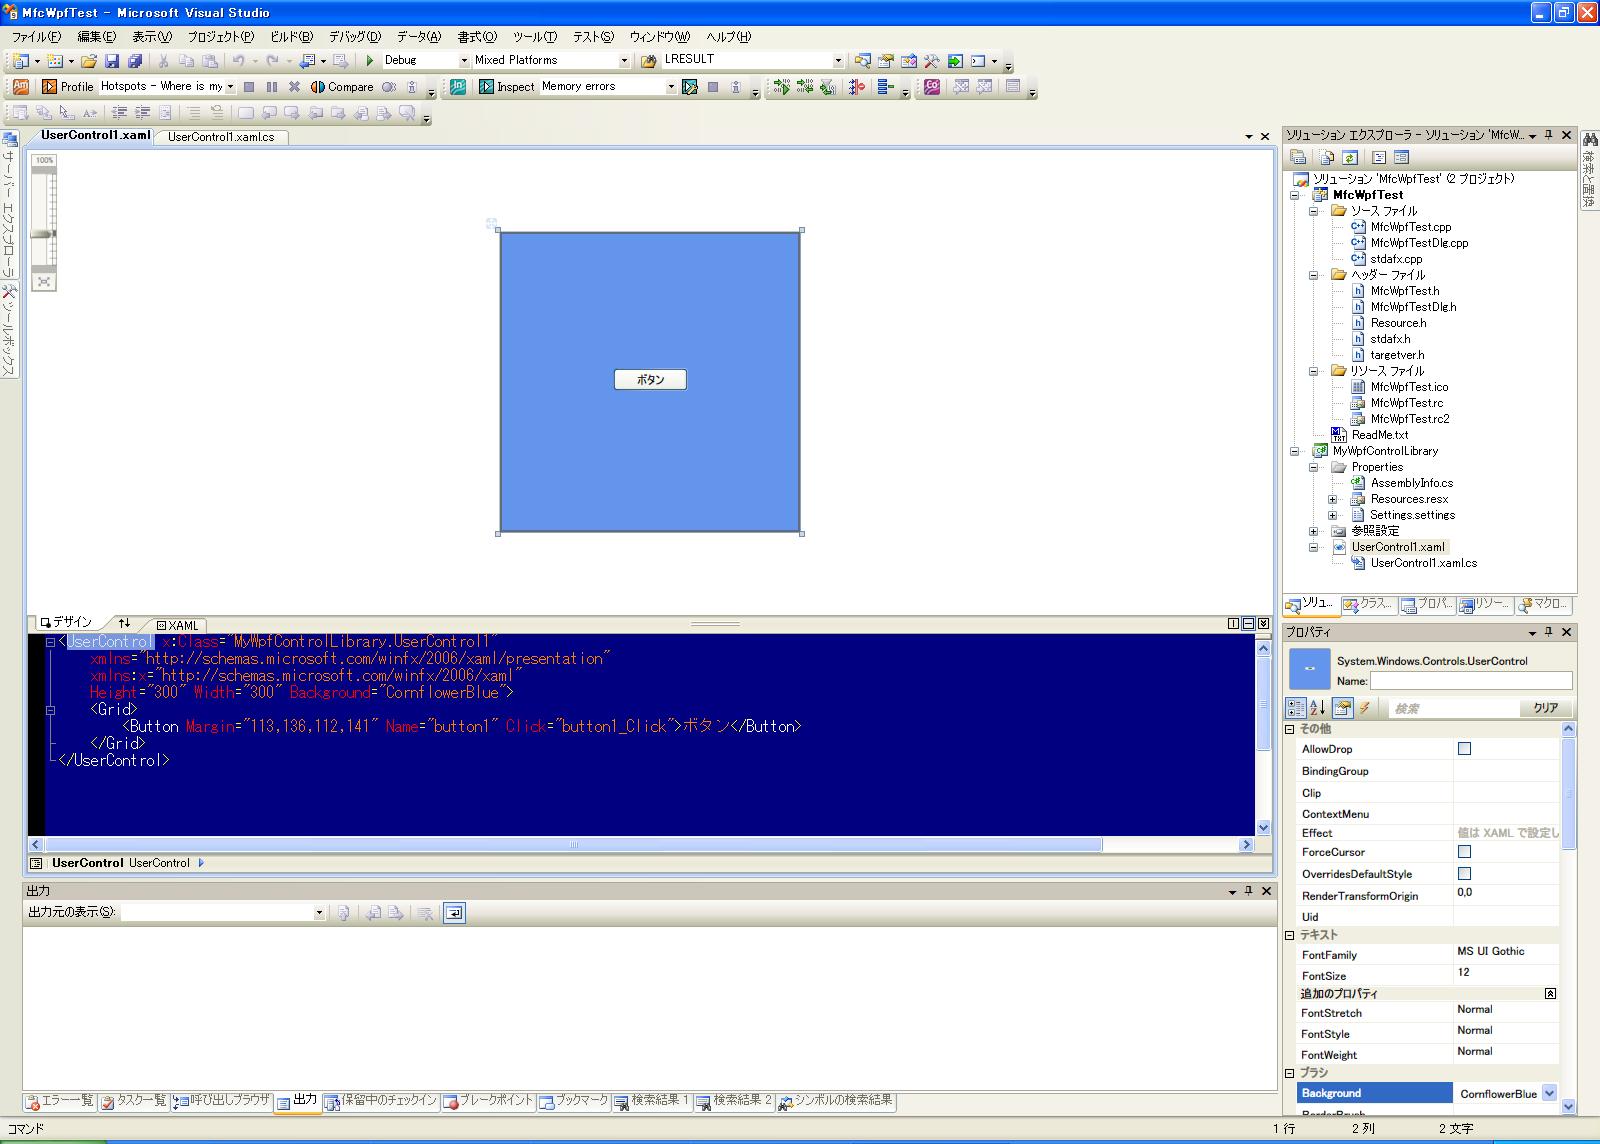 https://sygh-jp.github.io/content_hosting/my_program_ss/Wpf_Designer_Error_ss_2010_05_31a.png